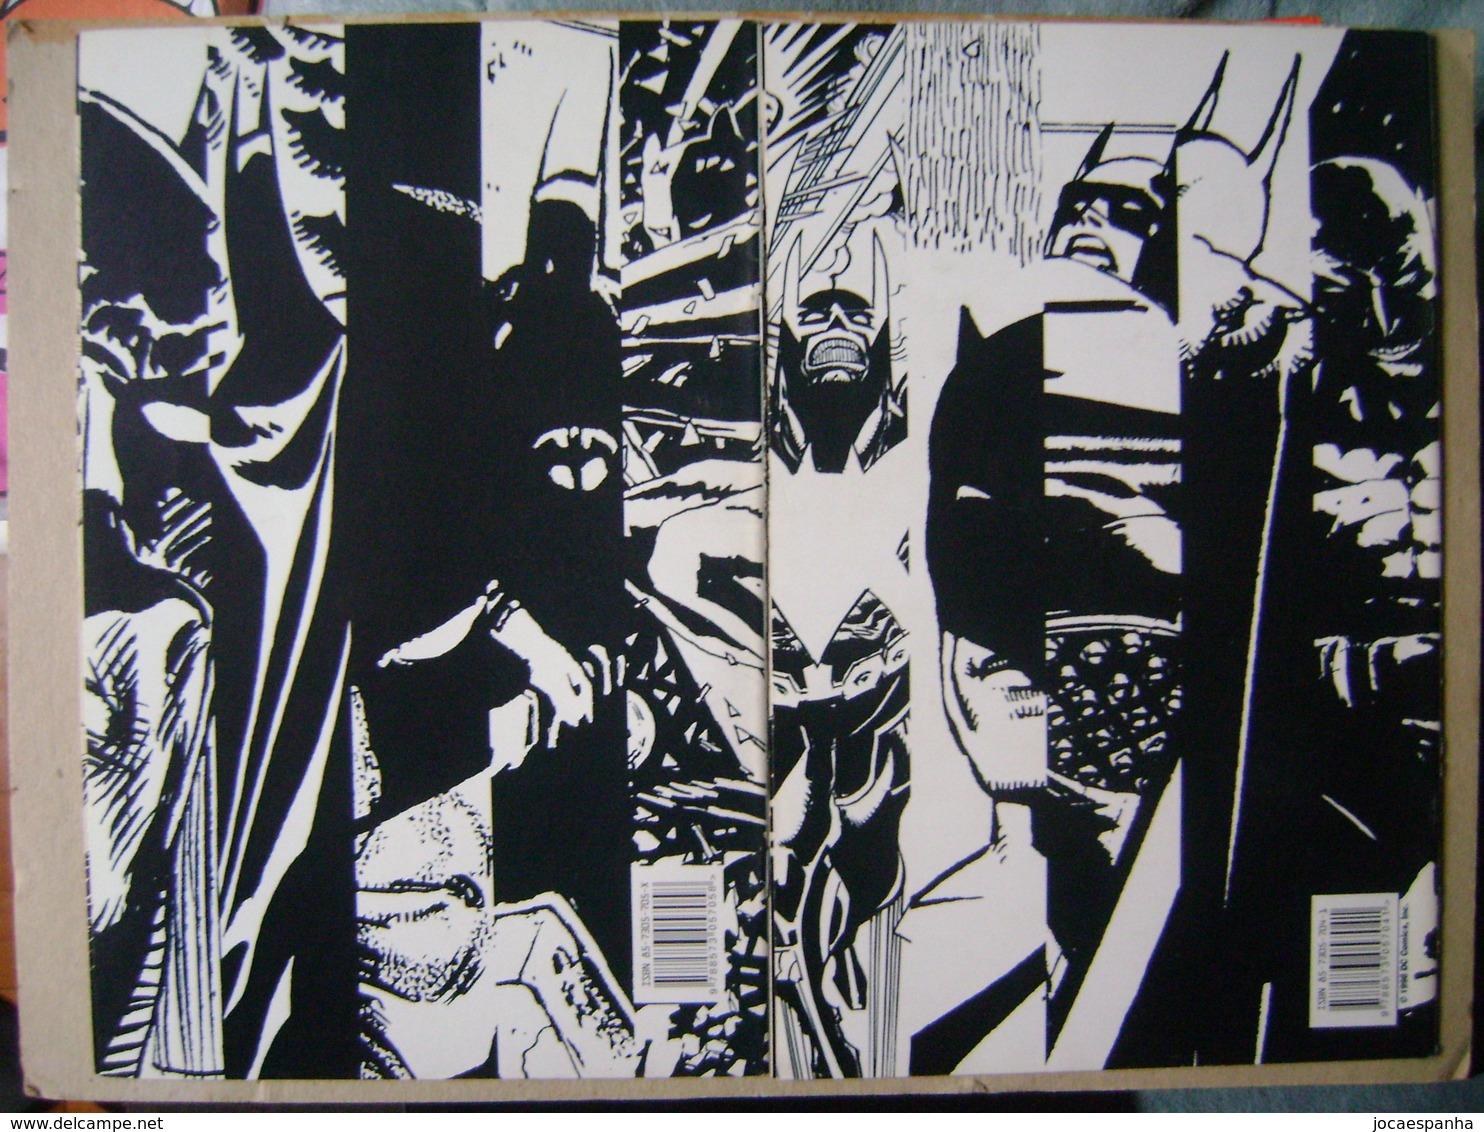 BATMAN BLACK AND WHITE (BRAZIL) - QUINZENAL MINI-SERIES IN 4 EDITIONS, EDITORA APRIL JOVEM - Books, Magazines, Comics